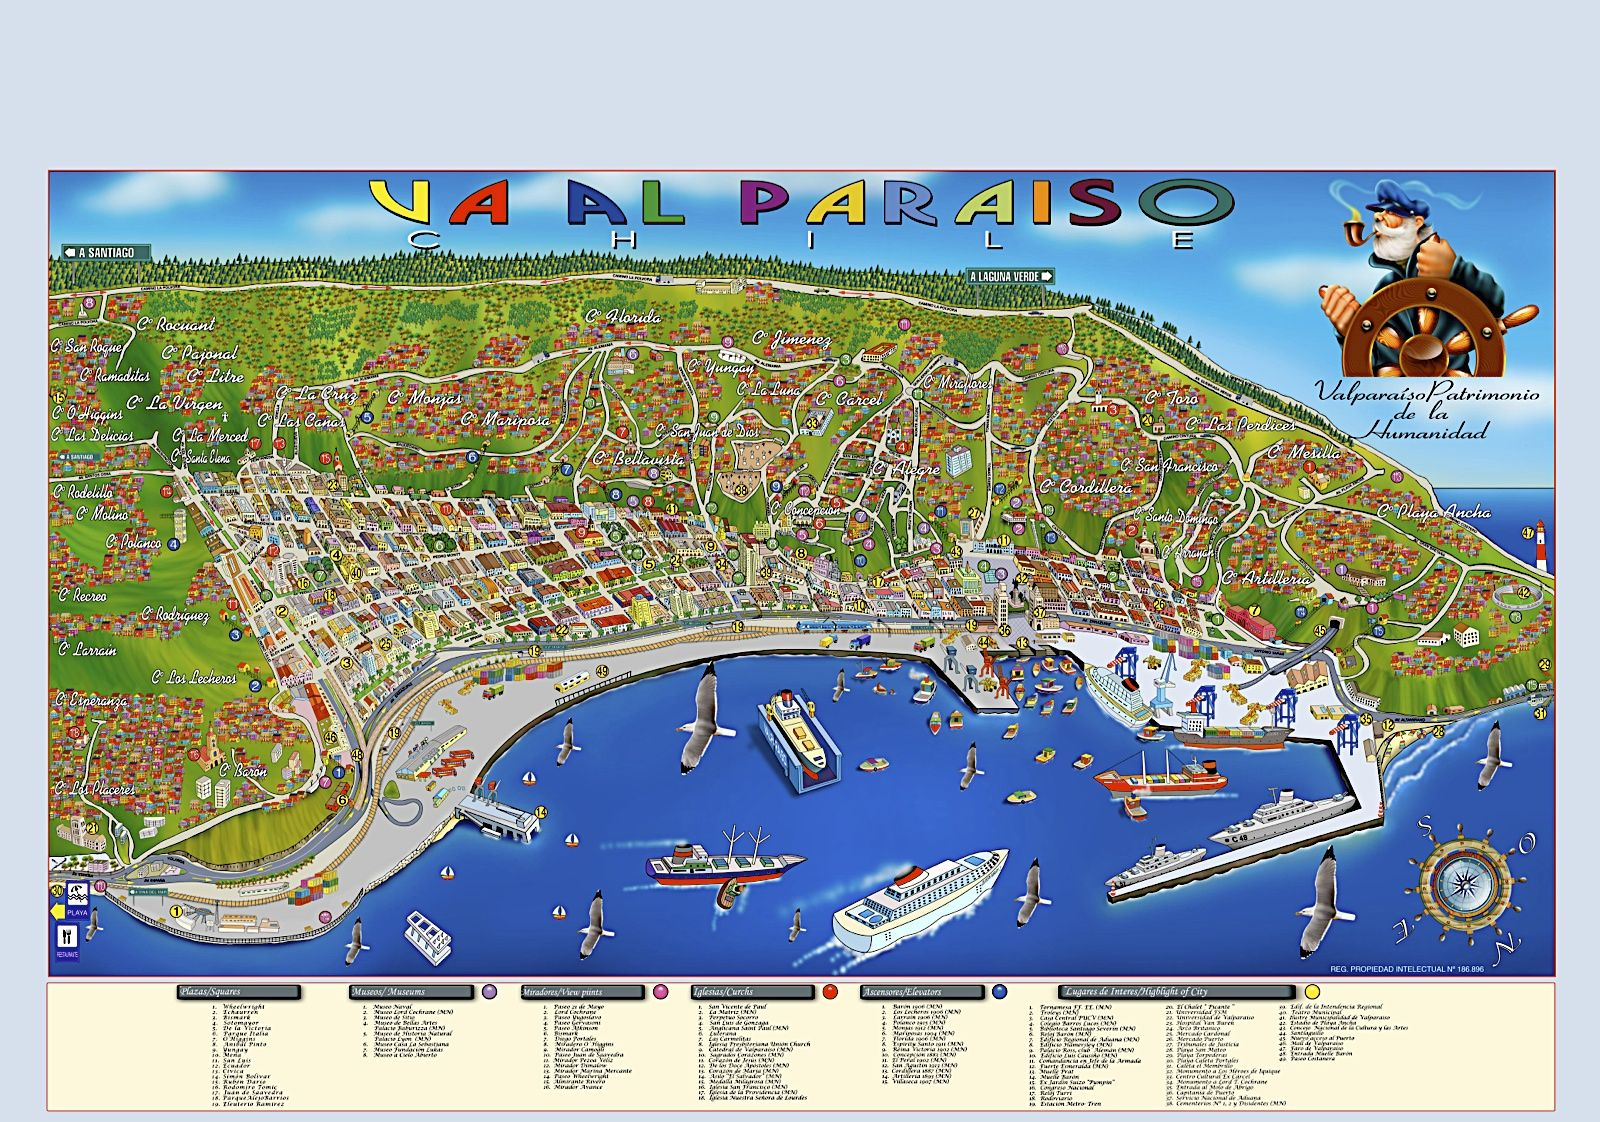 c1d1d8a9649ea www.guia turistica de valparaiso - Buscar con Google Ciudad De Santiago